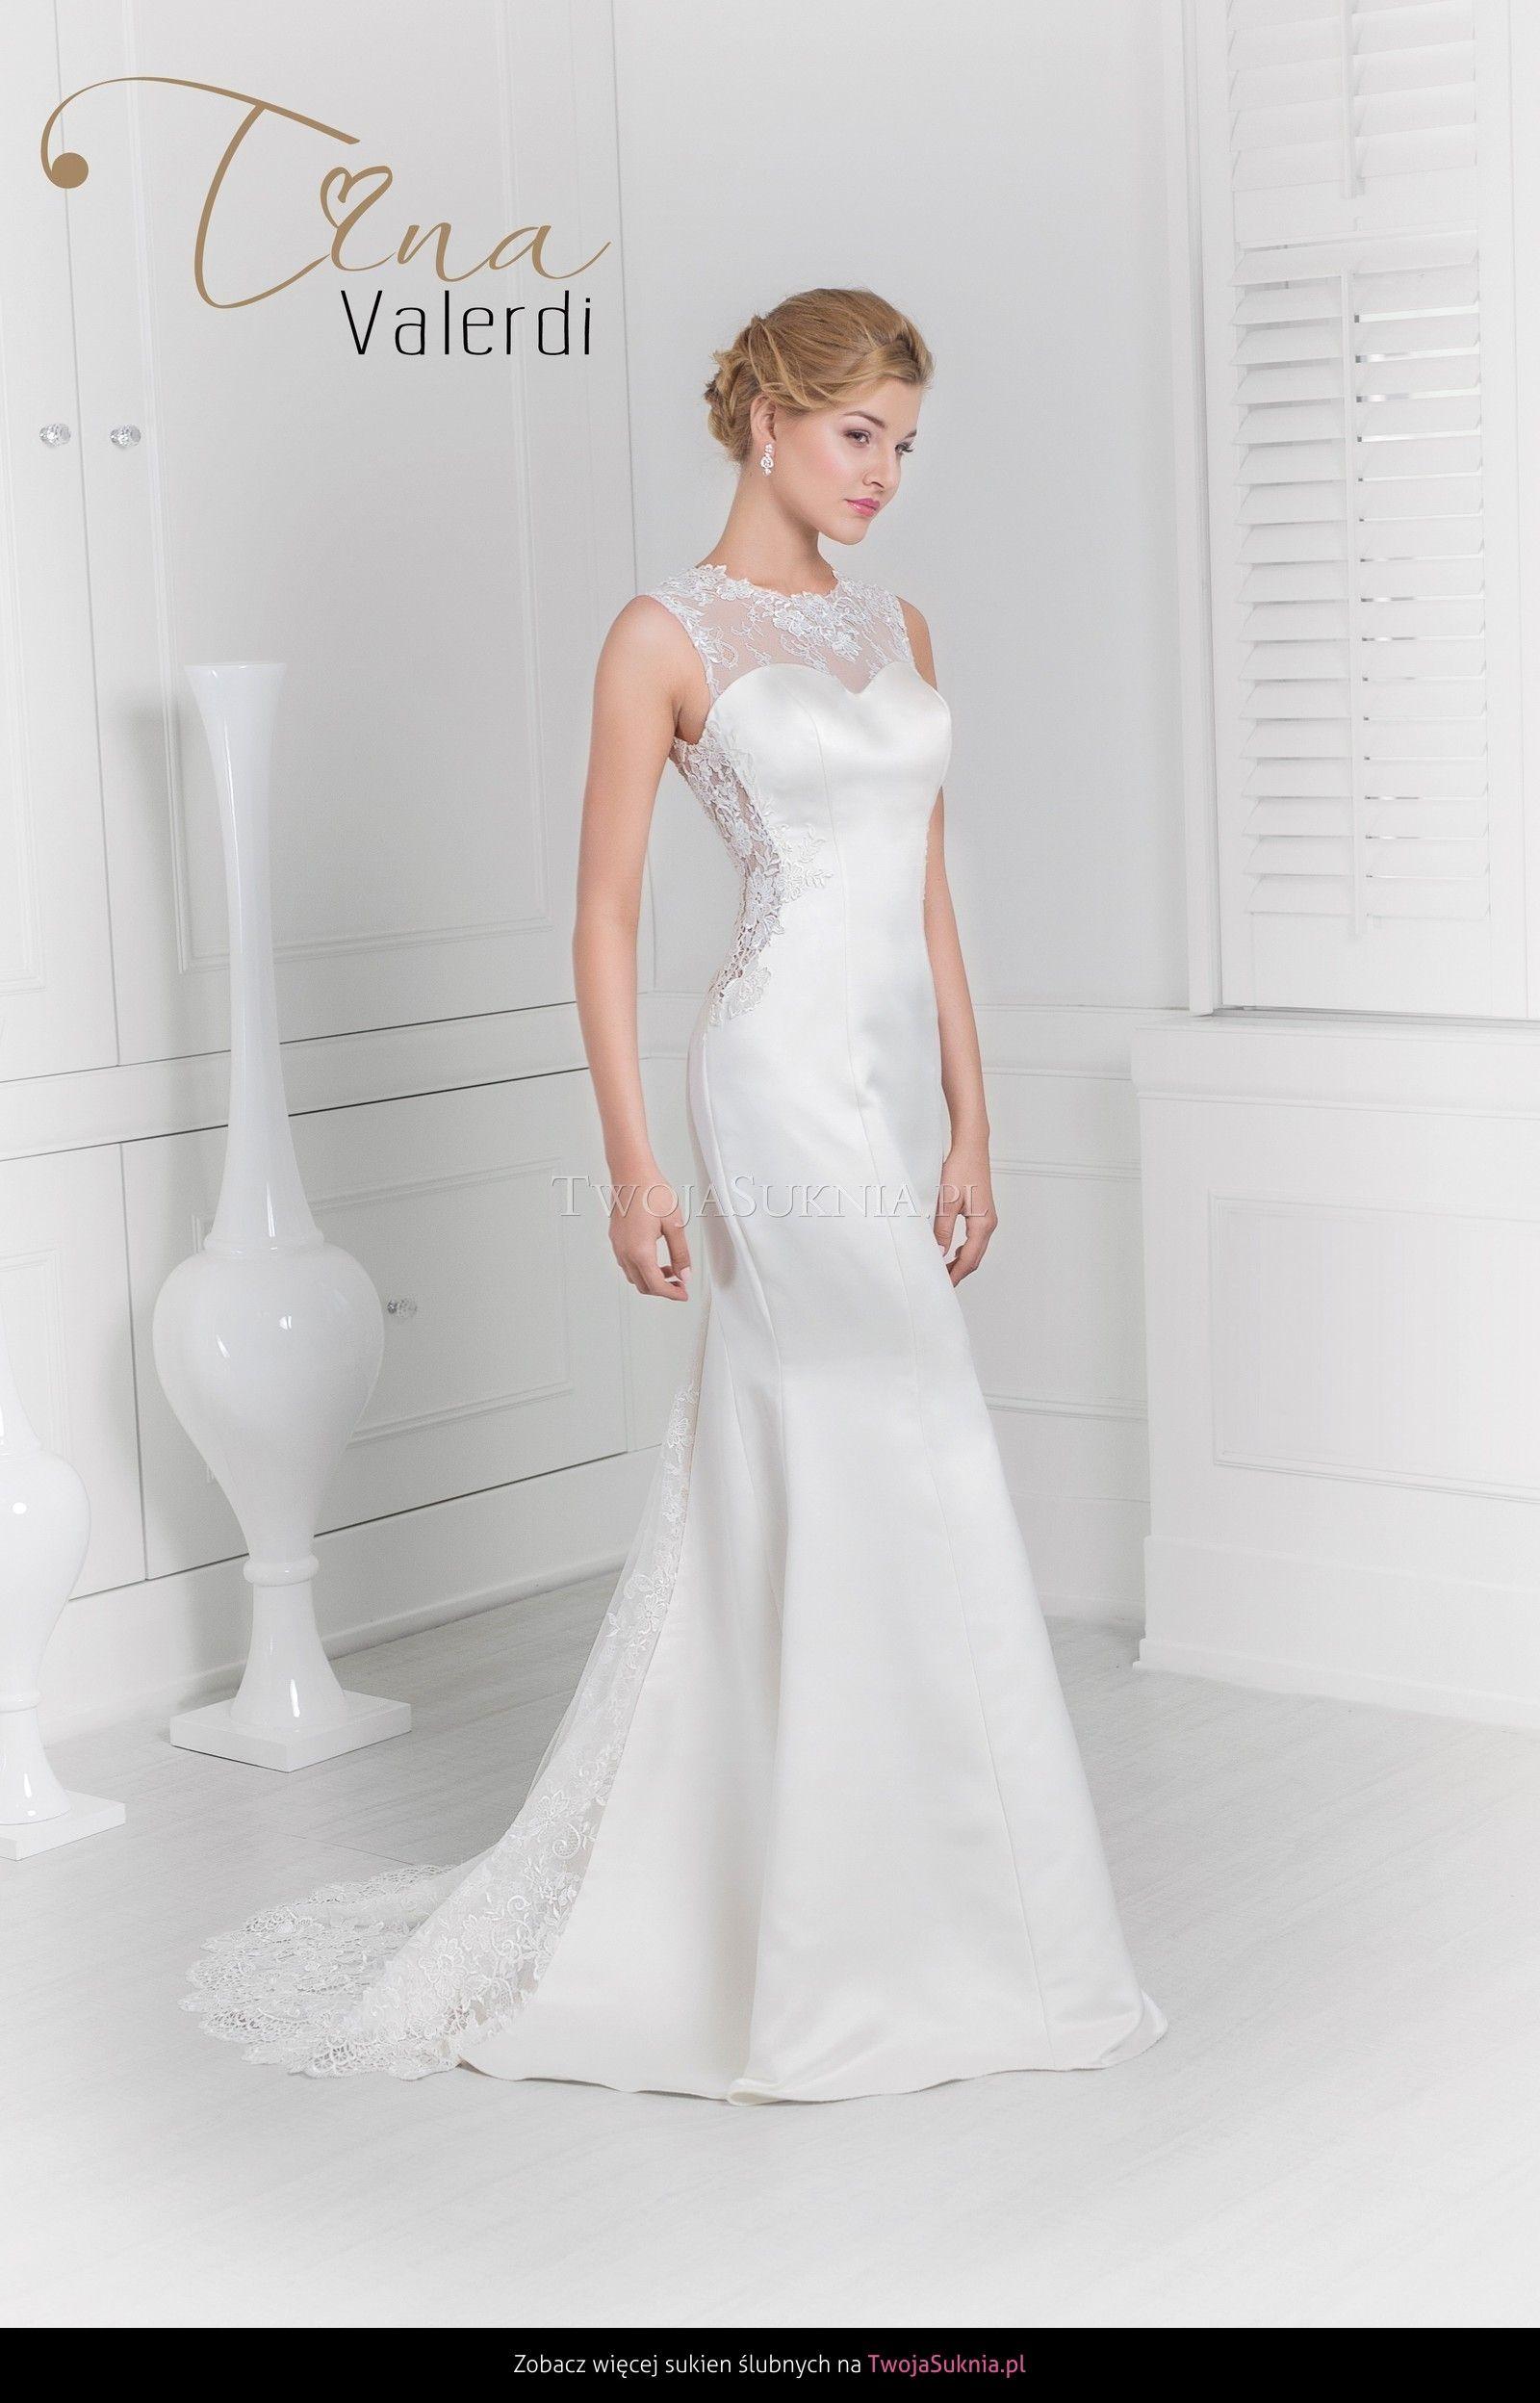 Suknia Slubna Tina Valerdi Enigma 2016 Twojasuknia Pl Wedding Dresses Dresses One Shoulder Wedding Dress